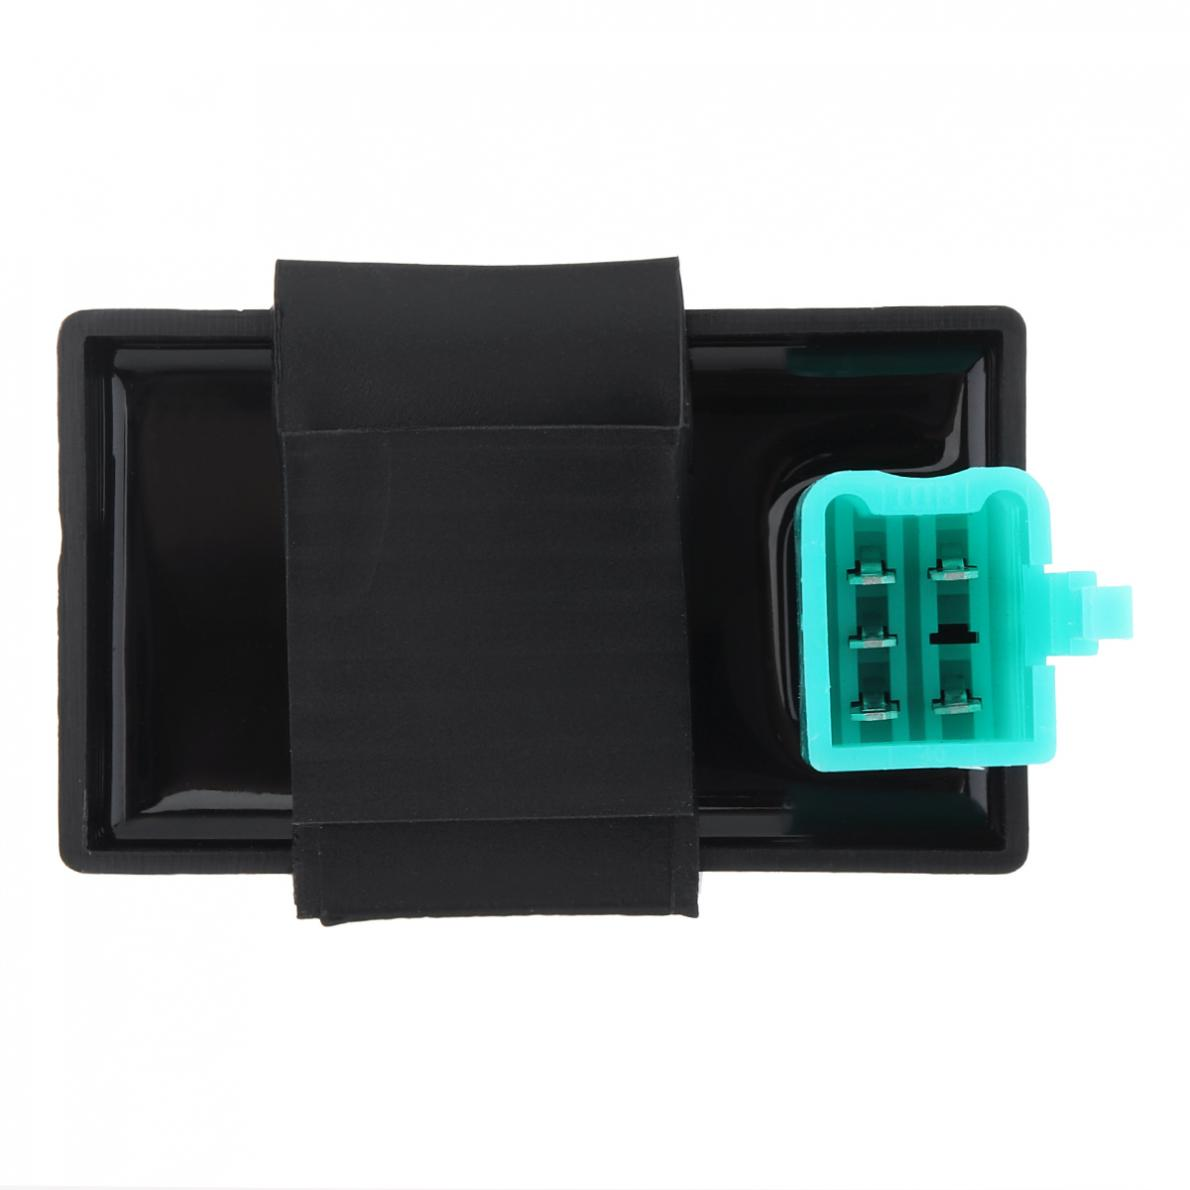 1pcs Durable 12V CDI BOX 5 Pin Plug AC Igniter Suitable for Off-Road Vehicle ATV ATV Motorcycle 50CC / 70CC / 100CC / 110CC